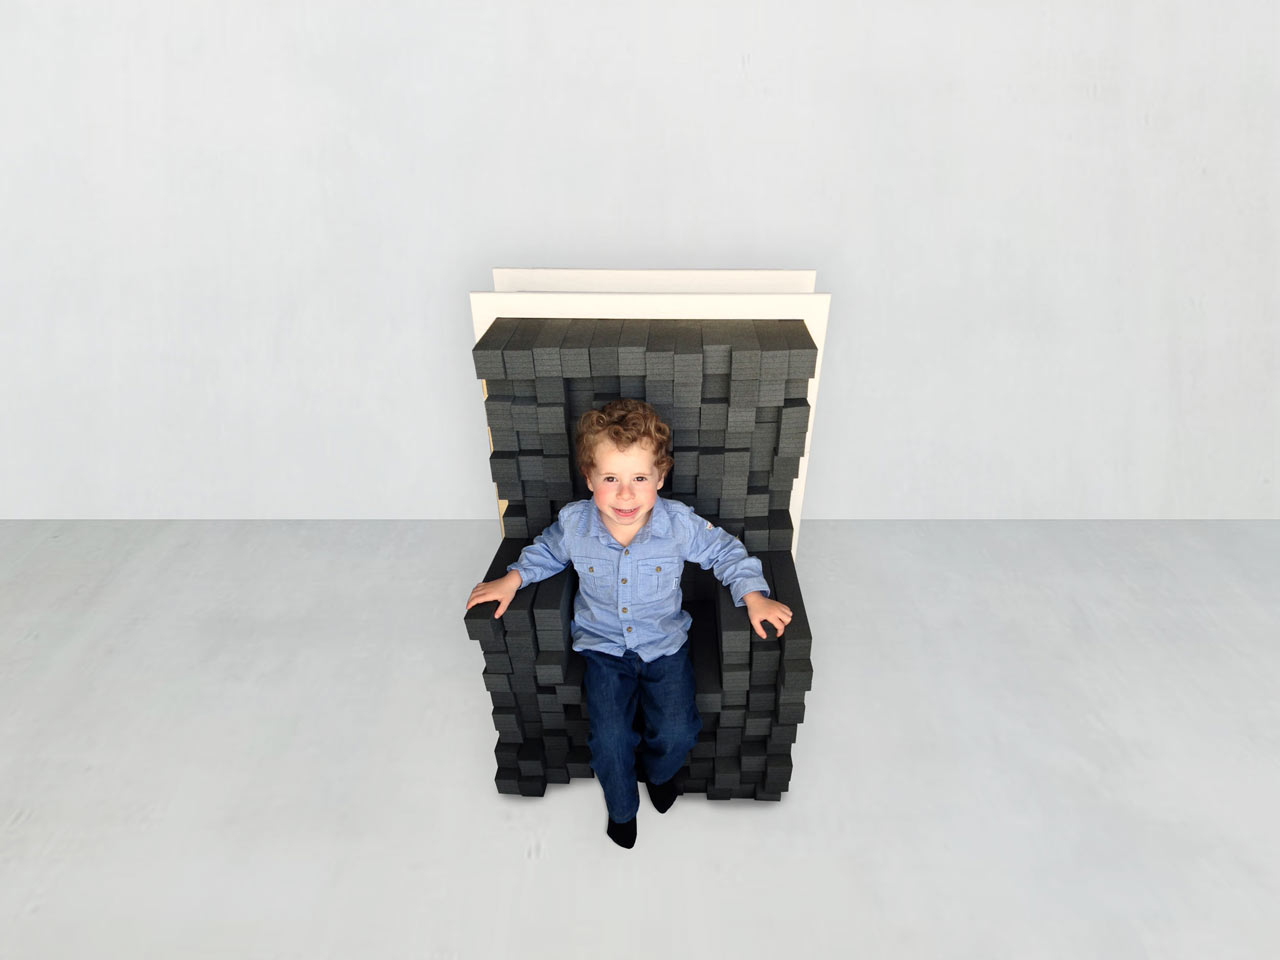 Keren_Shiker-Sink_In-Adjustable-Seating-hisheji (4)